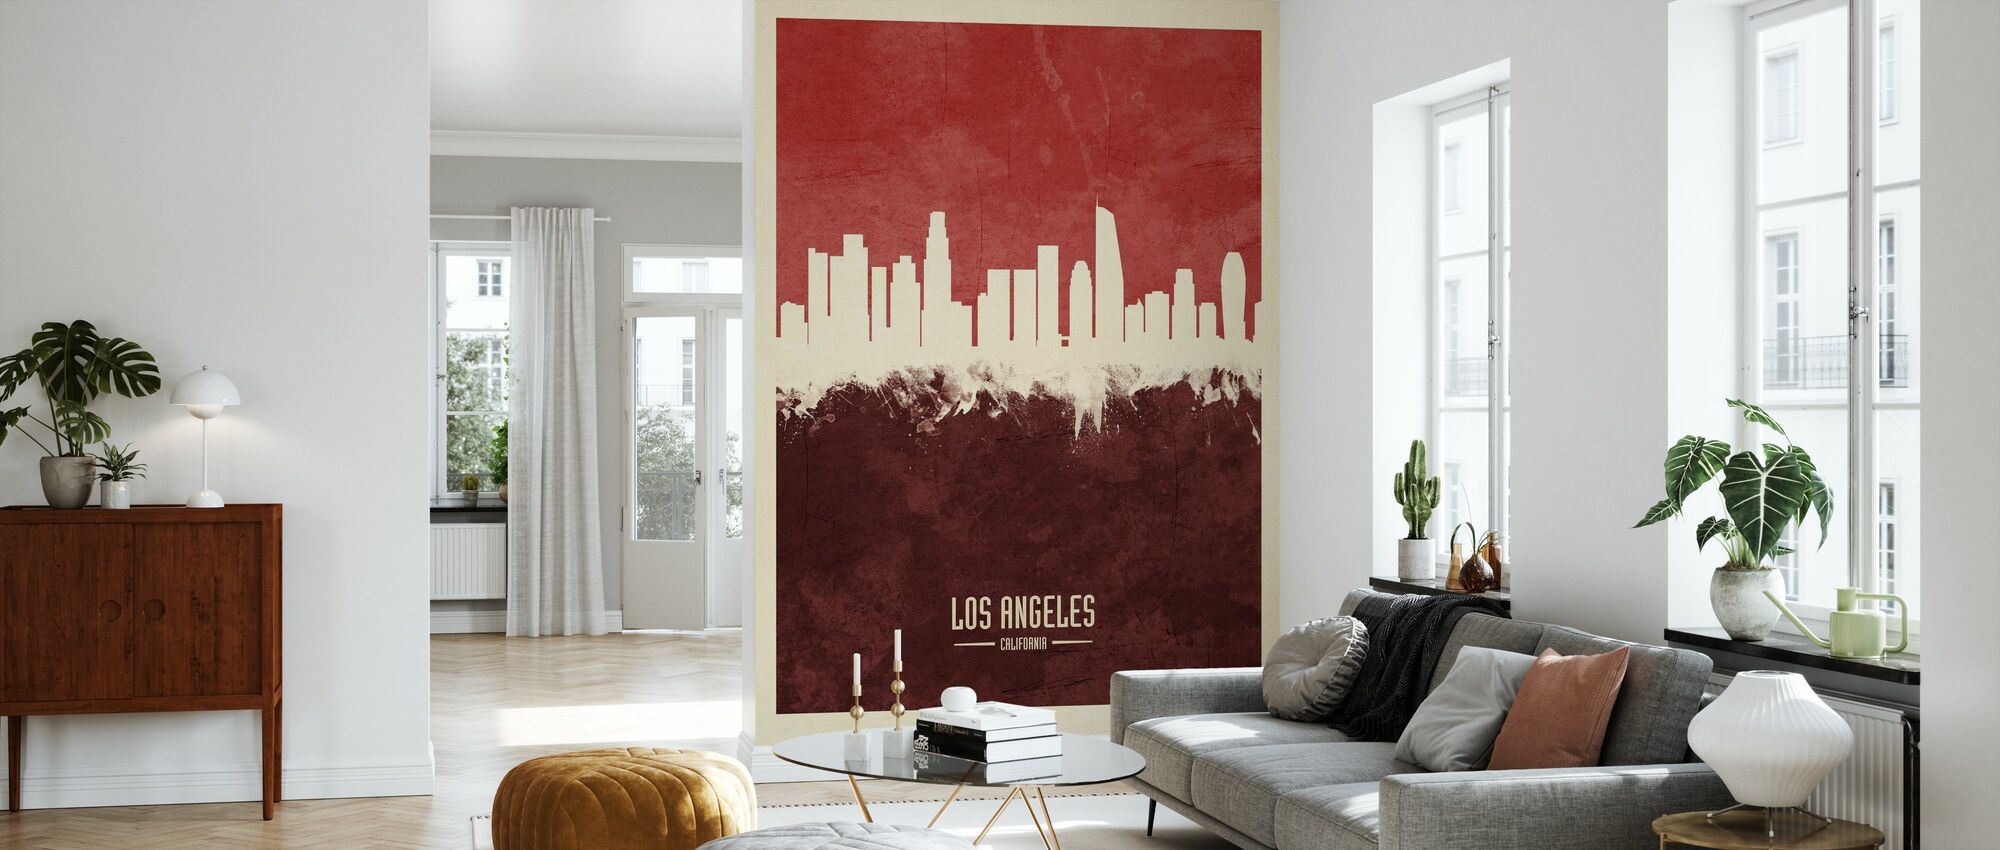 Los Angeles California Skyline Red - Wallpaper - Living Room